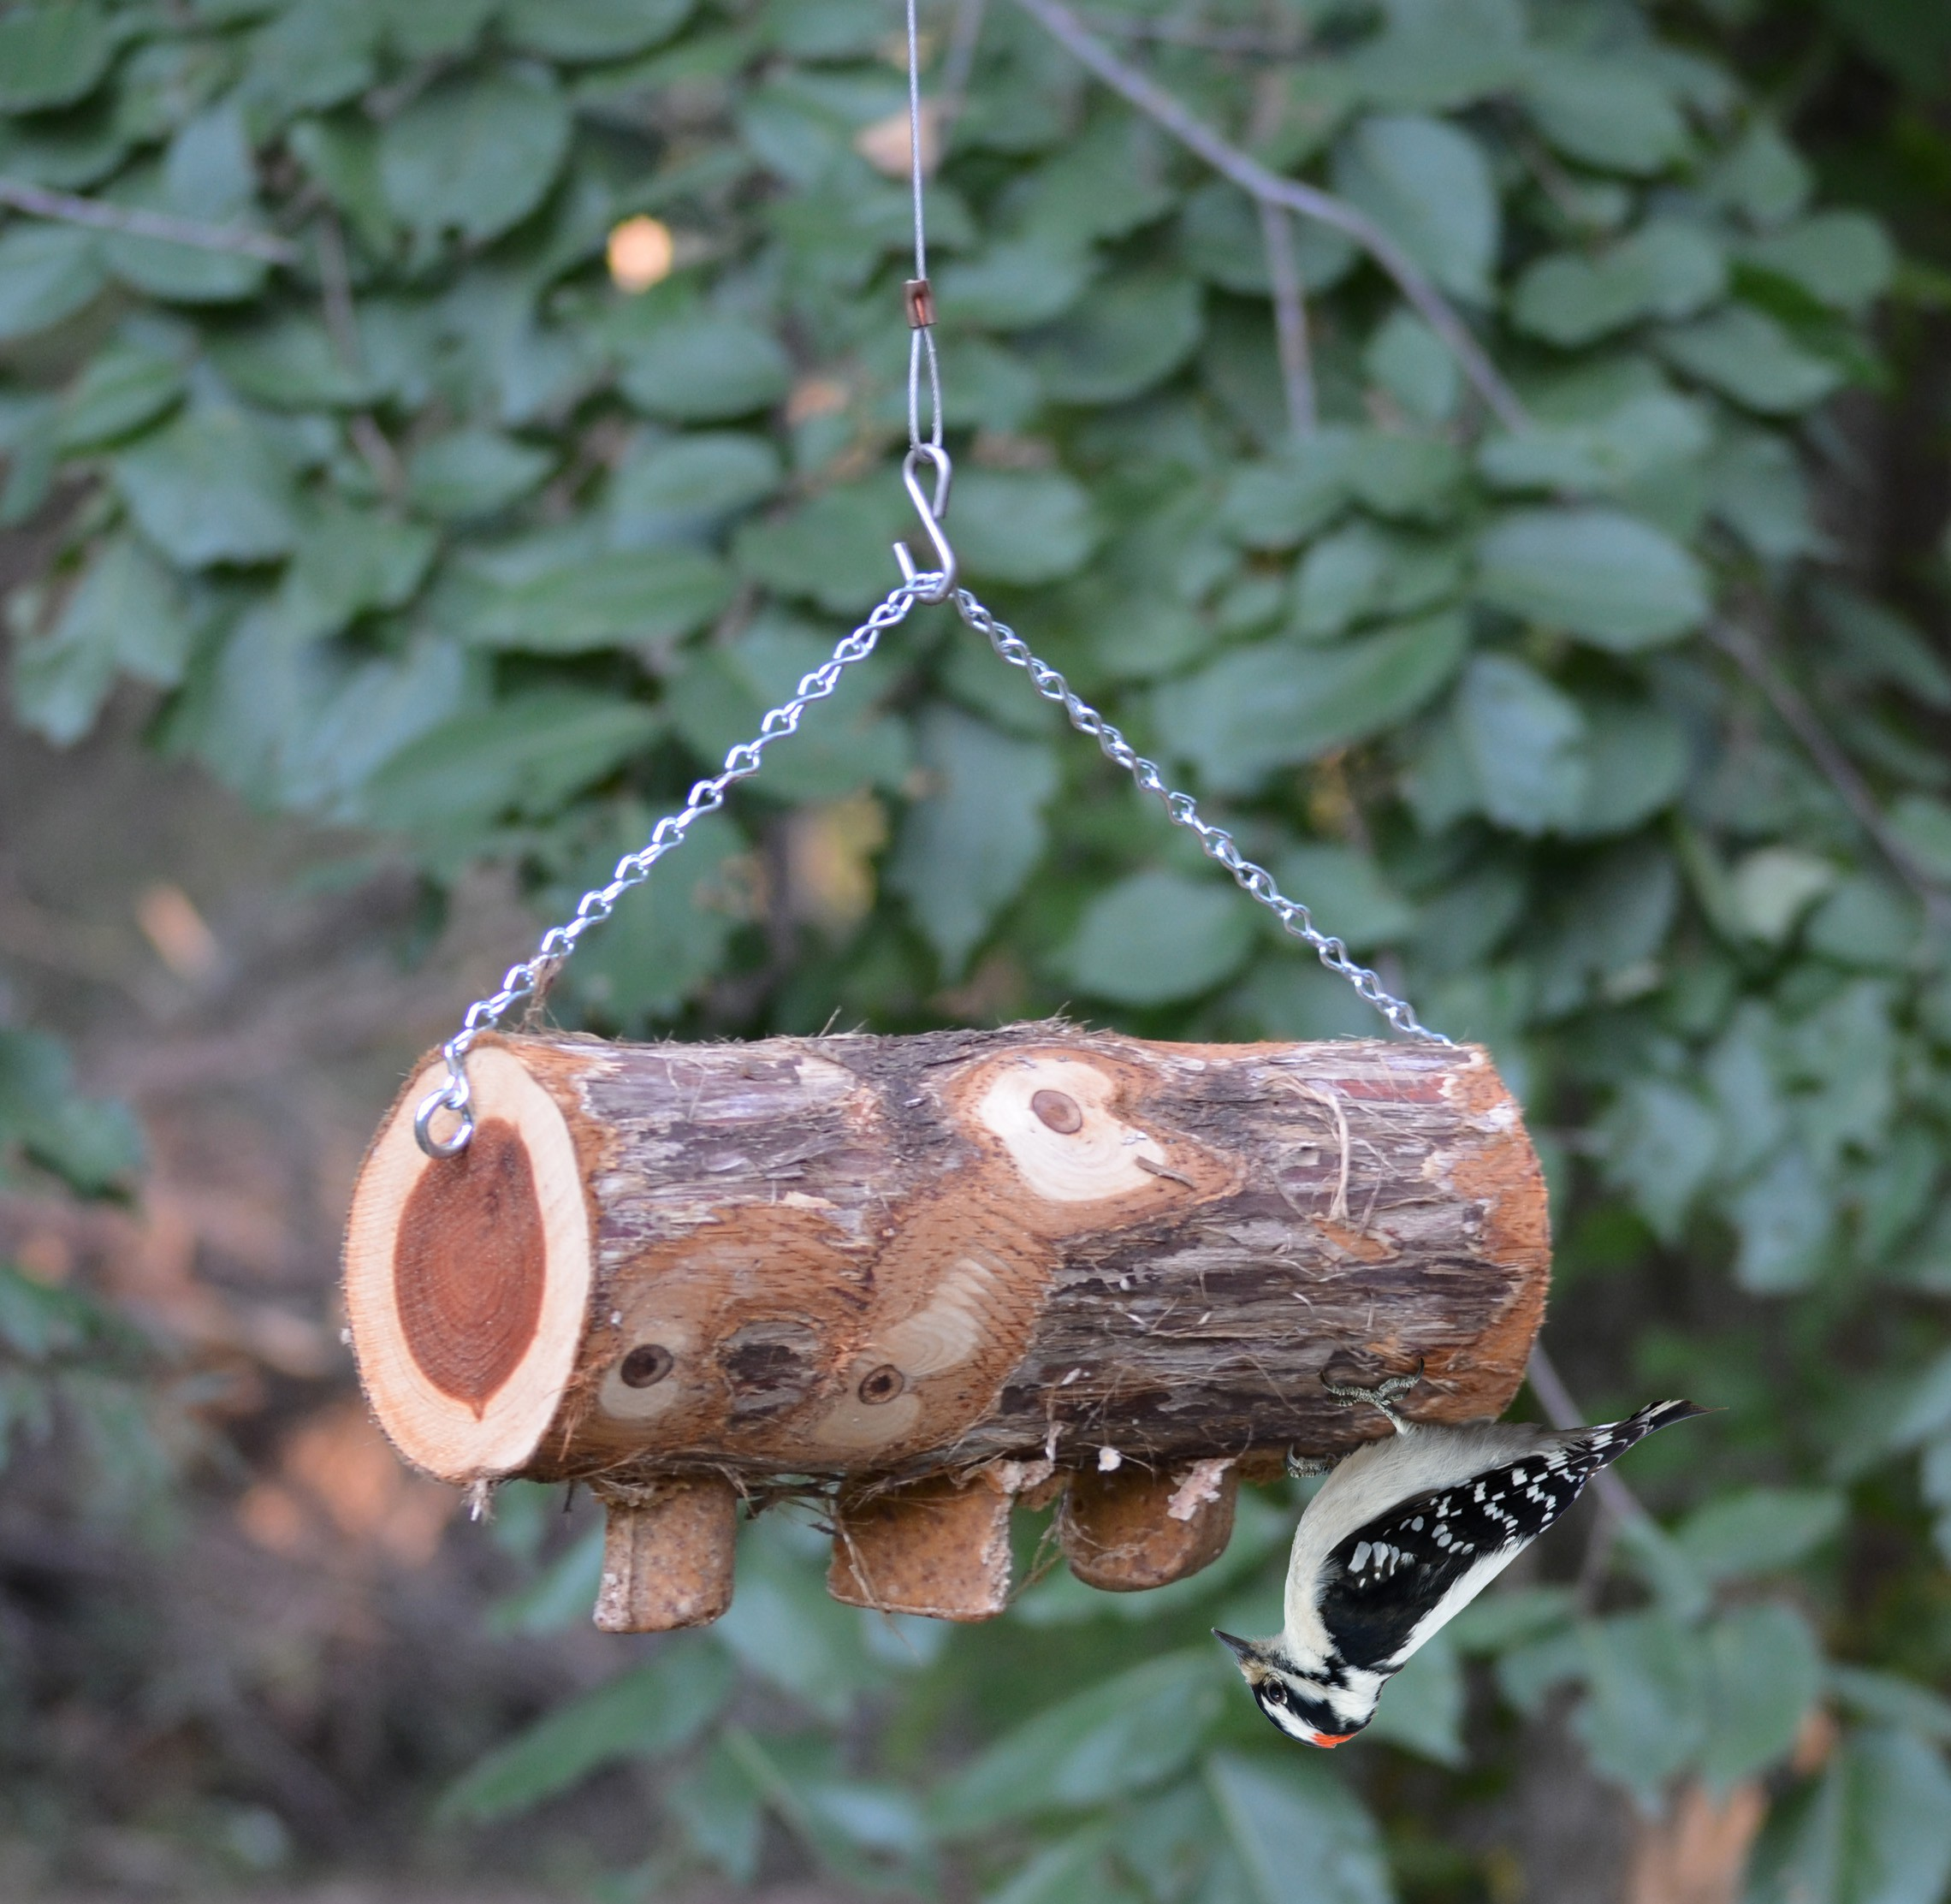 house product irish acrylic garden squirrel feeder window bird proof birds